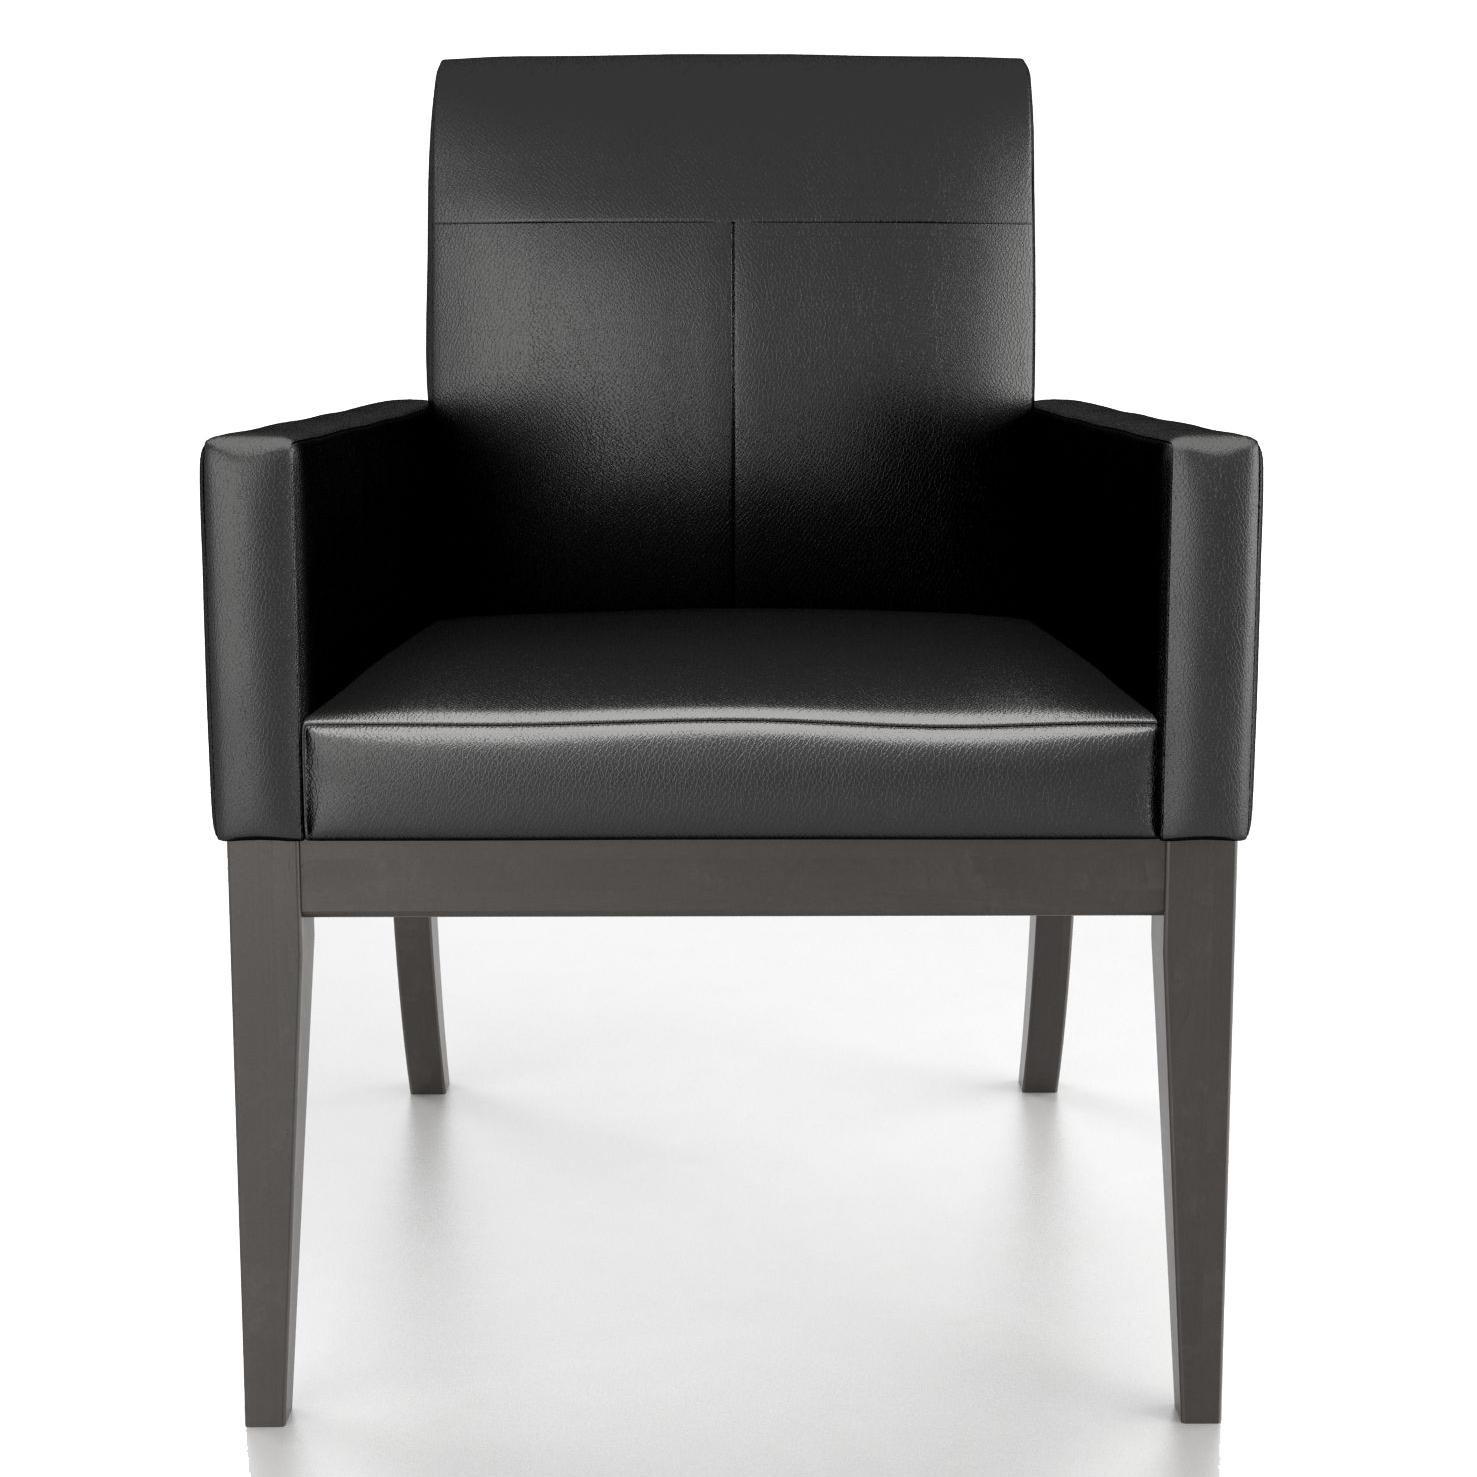 <b>Customizable</b> Upholstered Arm Chair